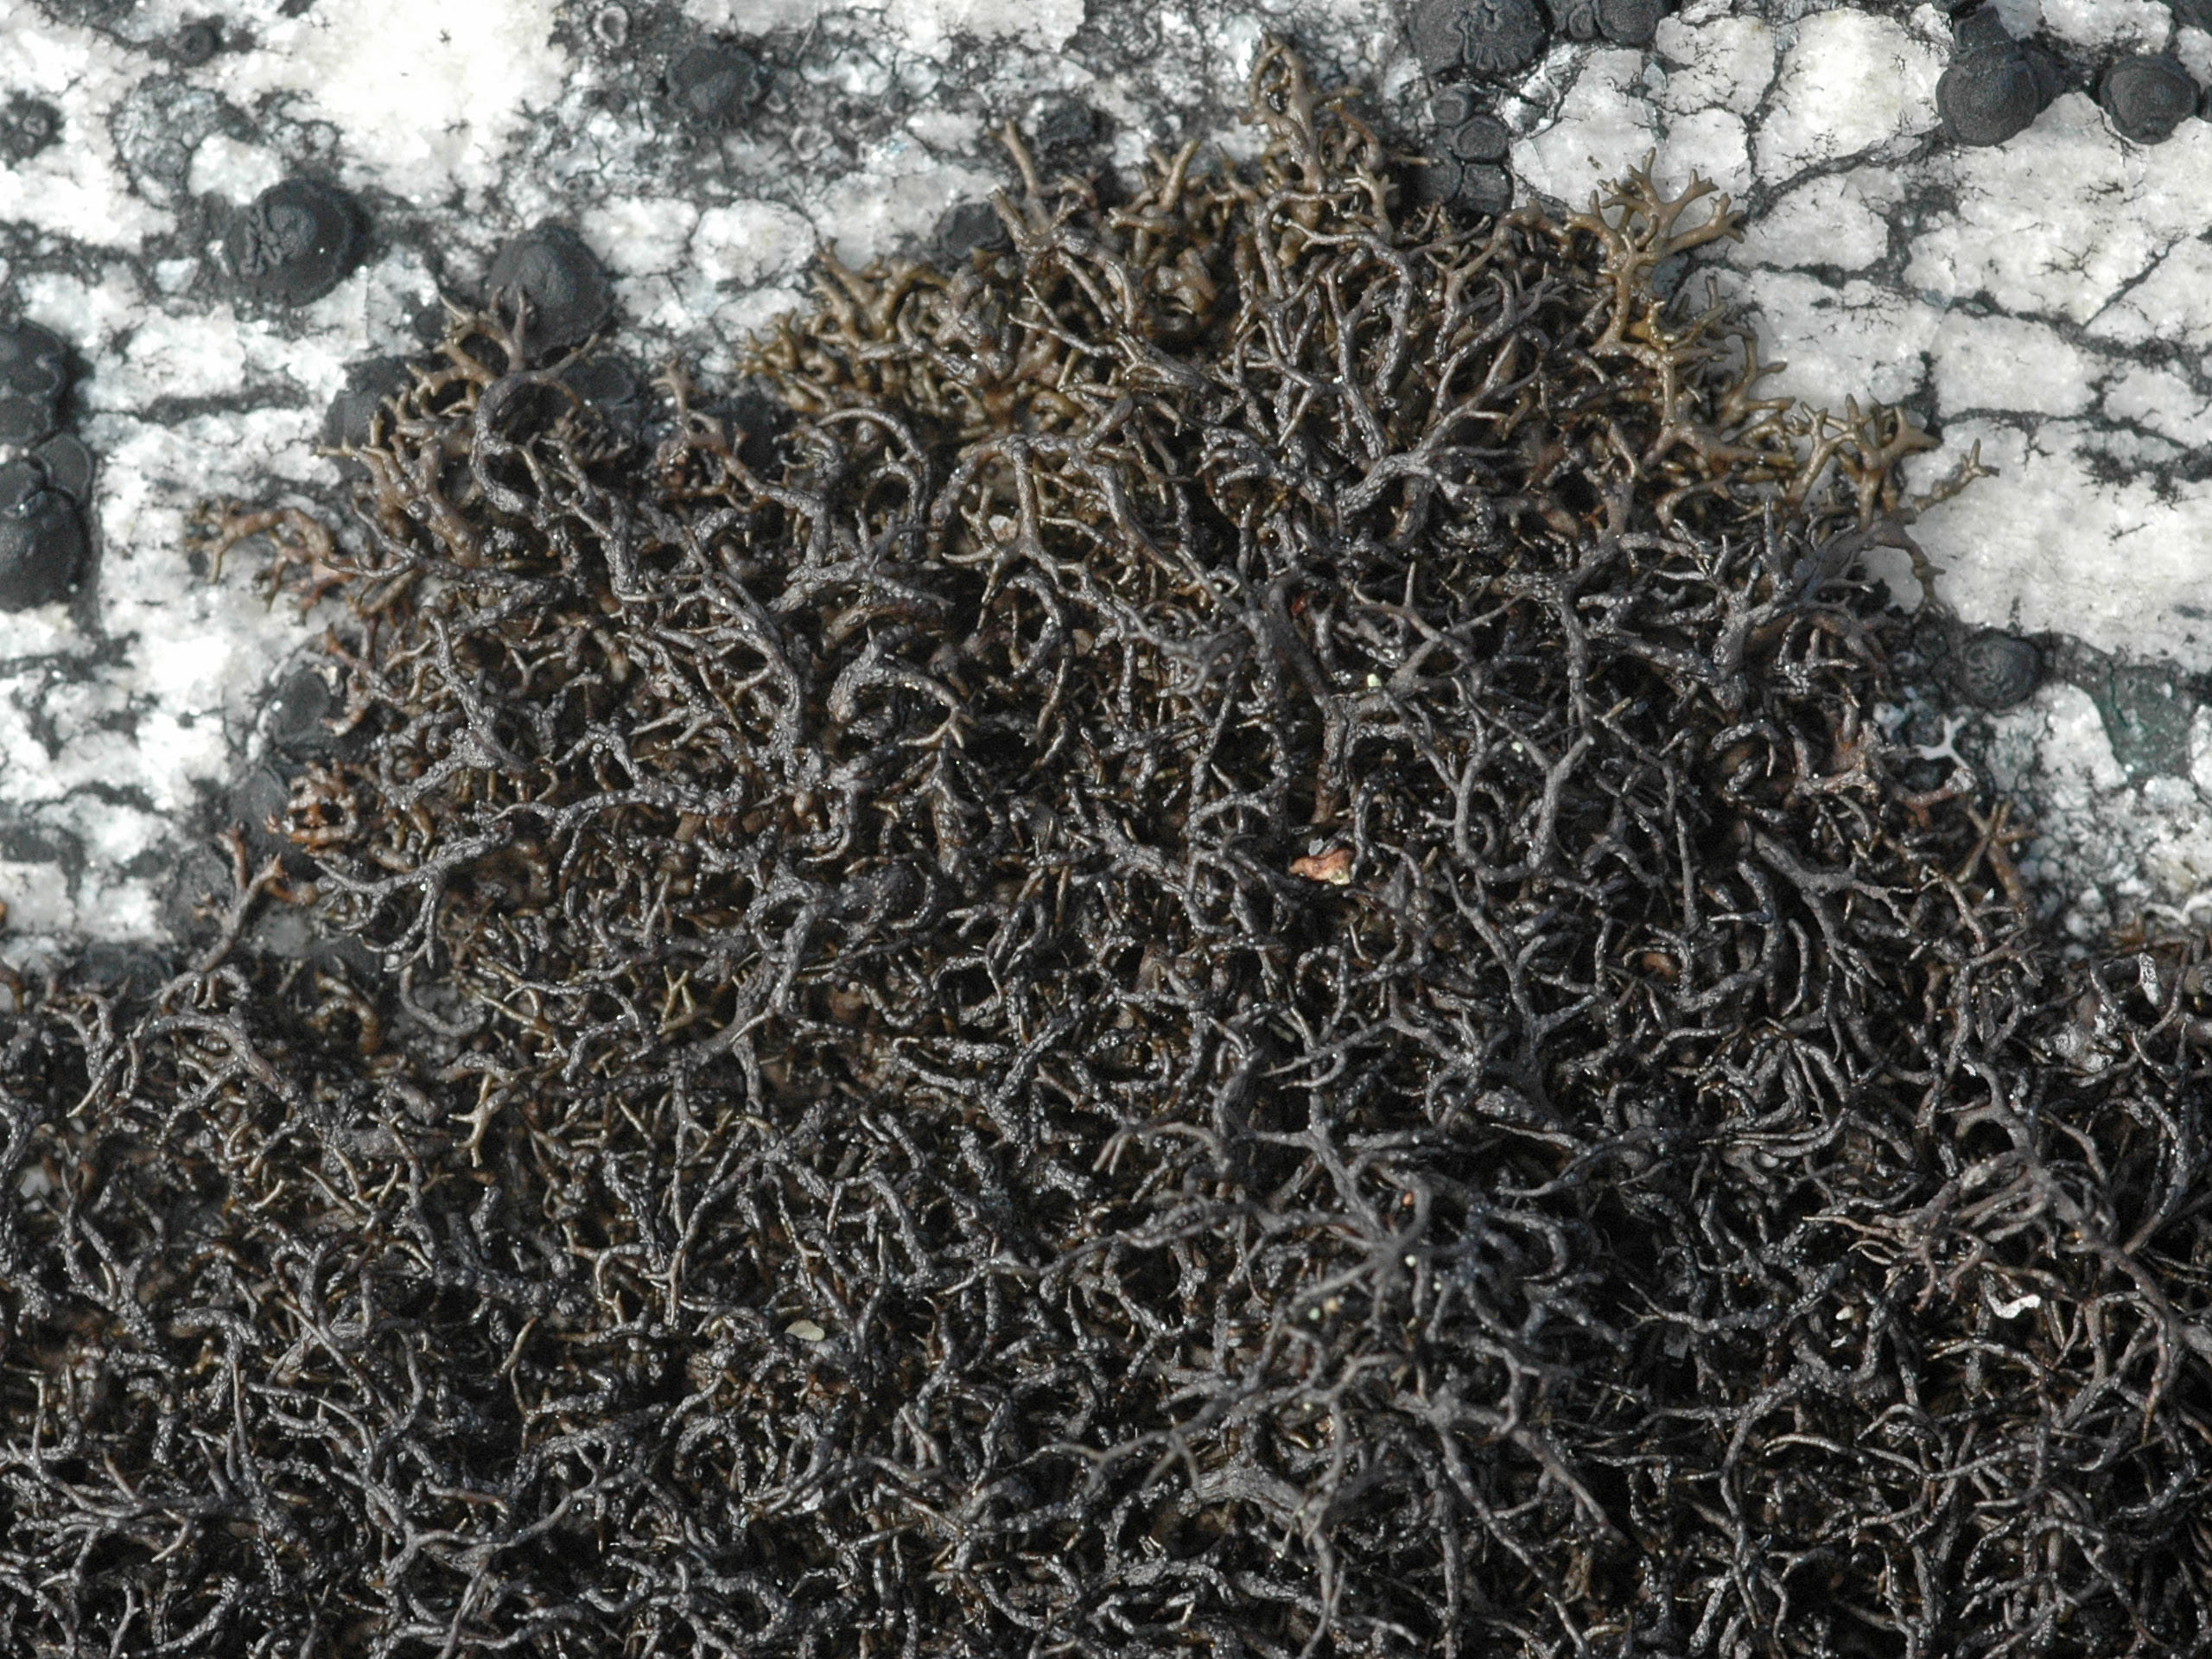 Pseudephebe pubescens